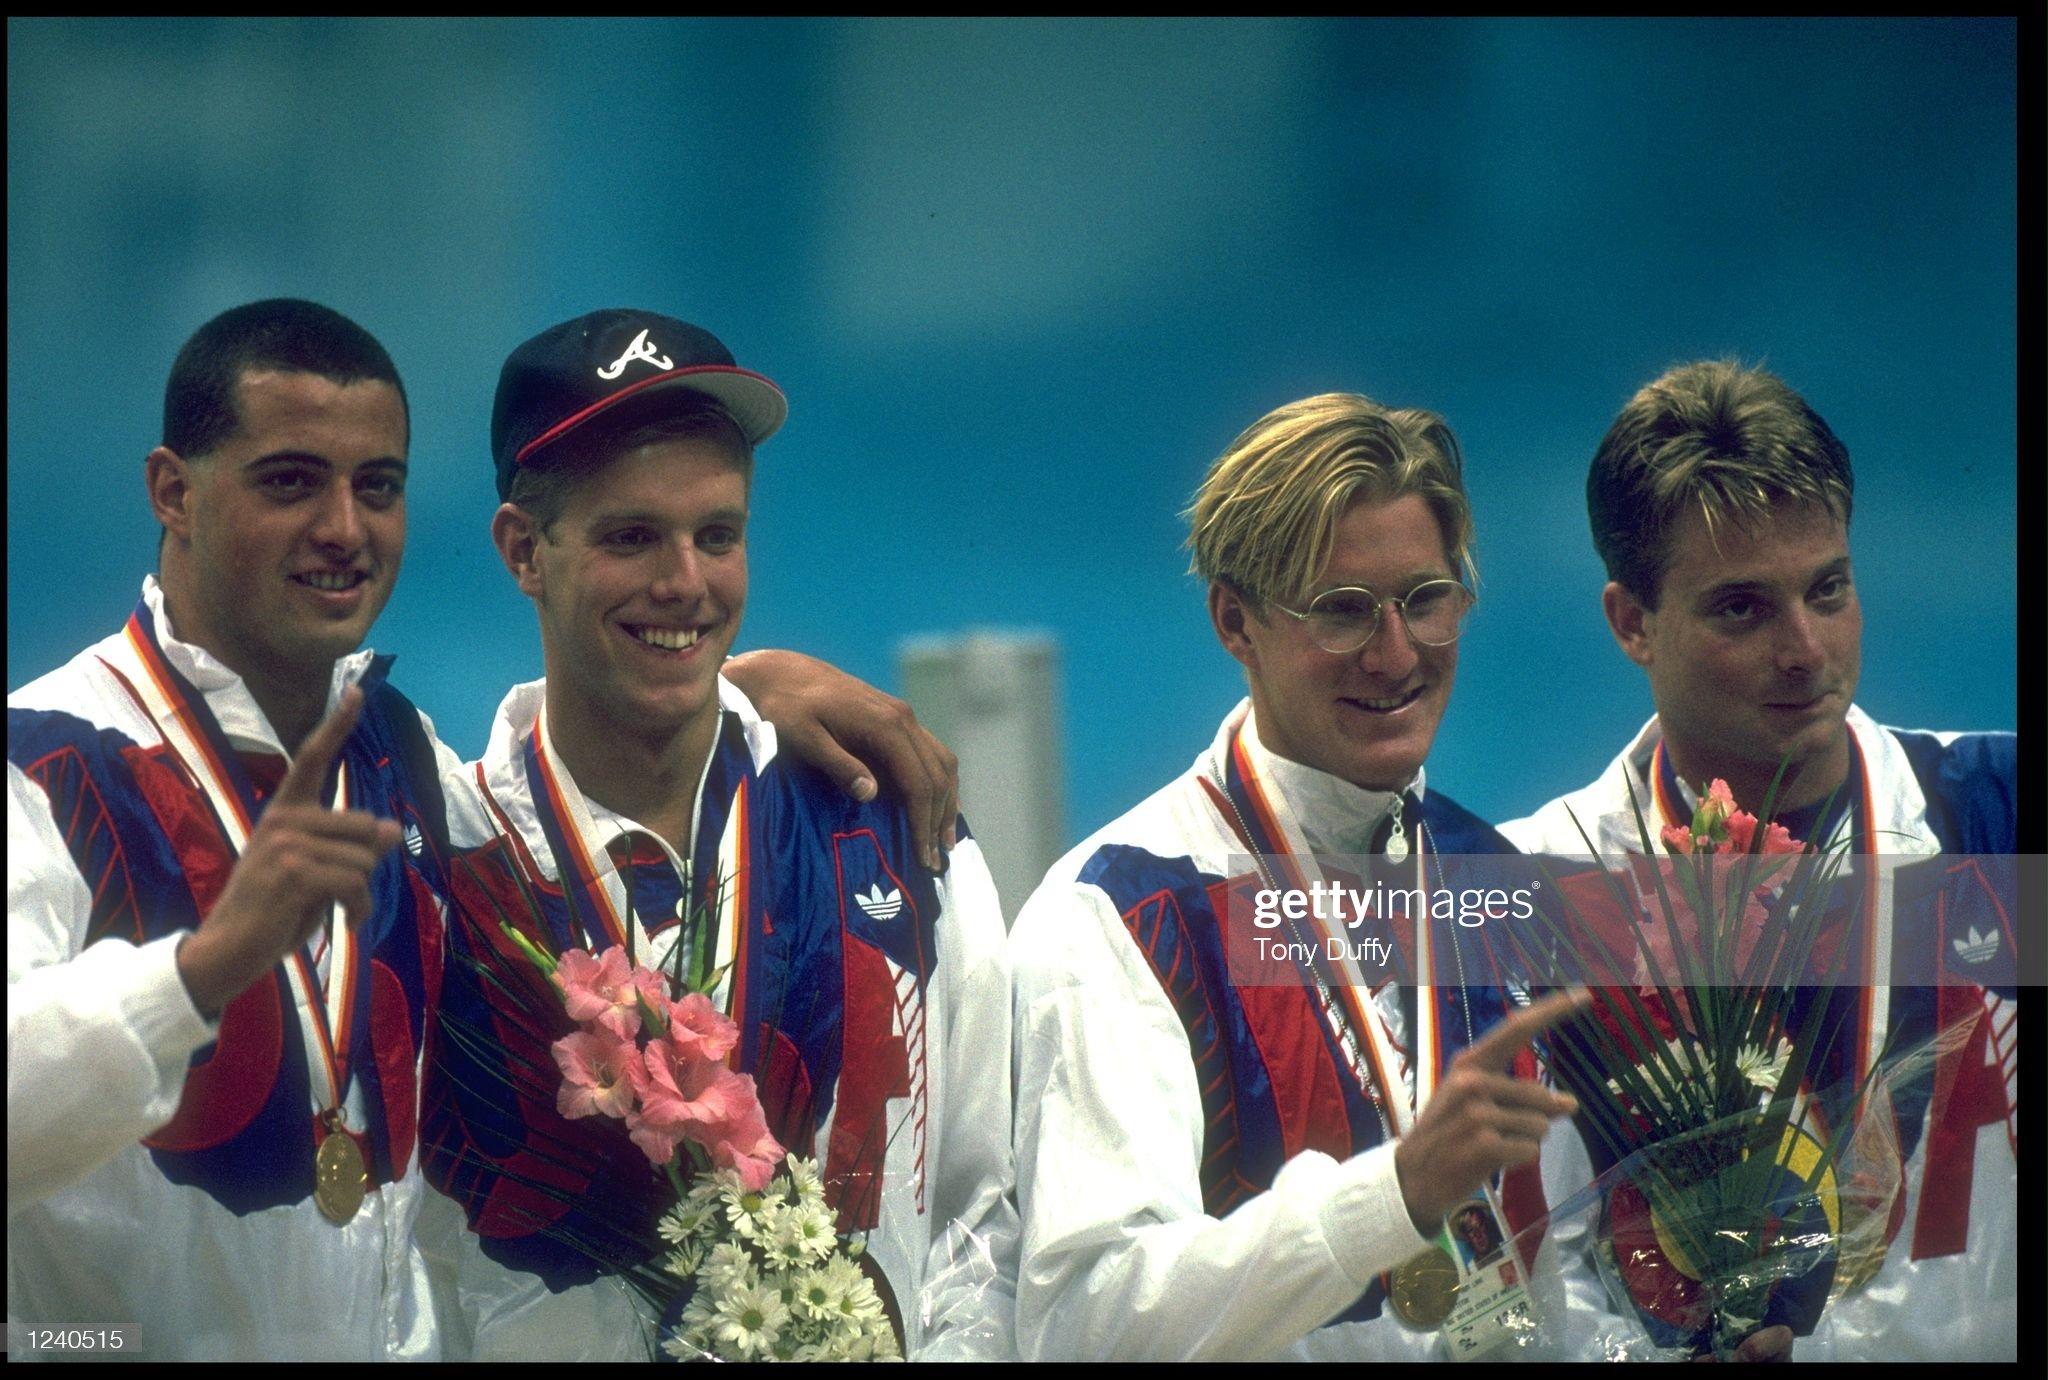 SWIMMING RELAY TEAM USA OLYMPICS : Fotografía de noticias